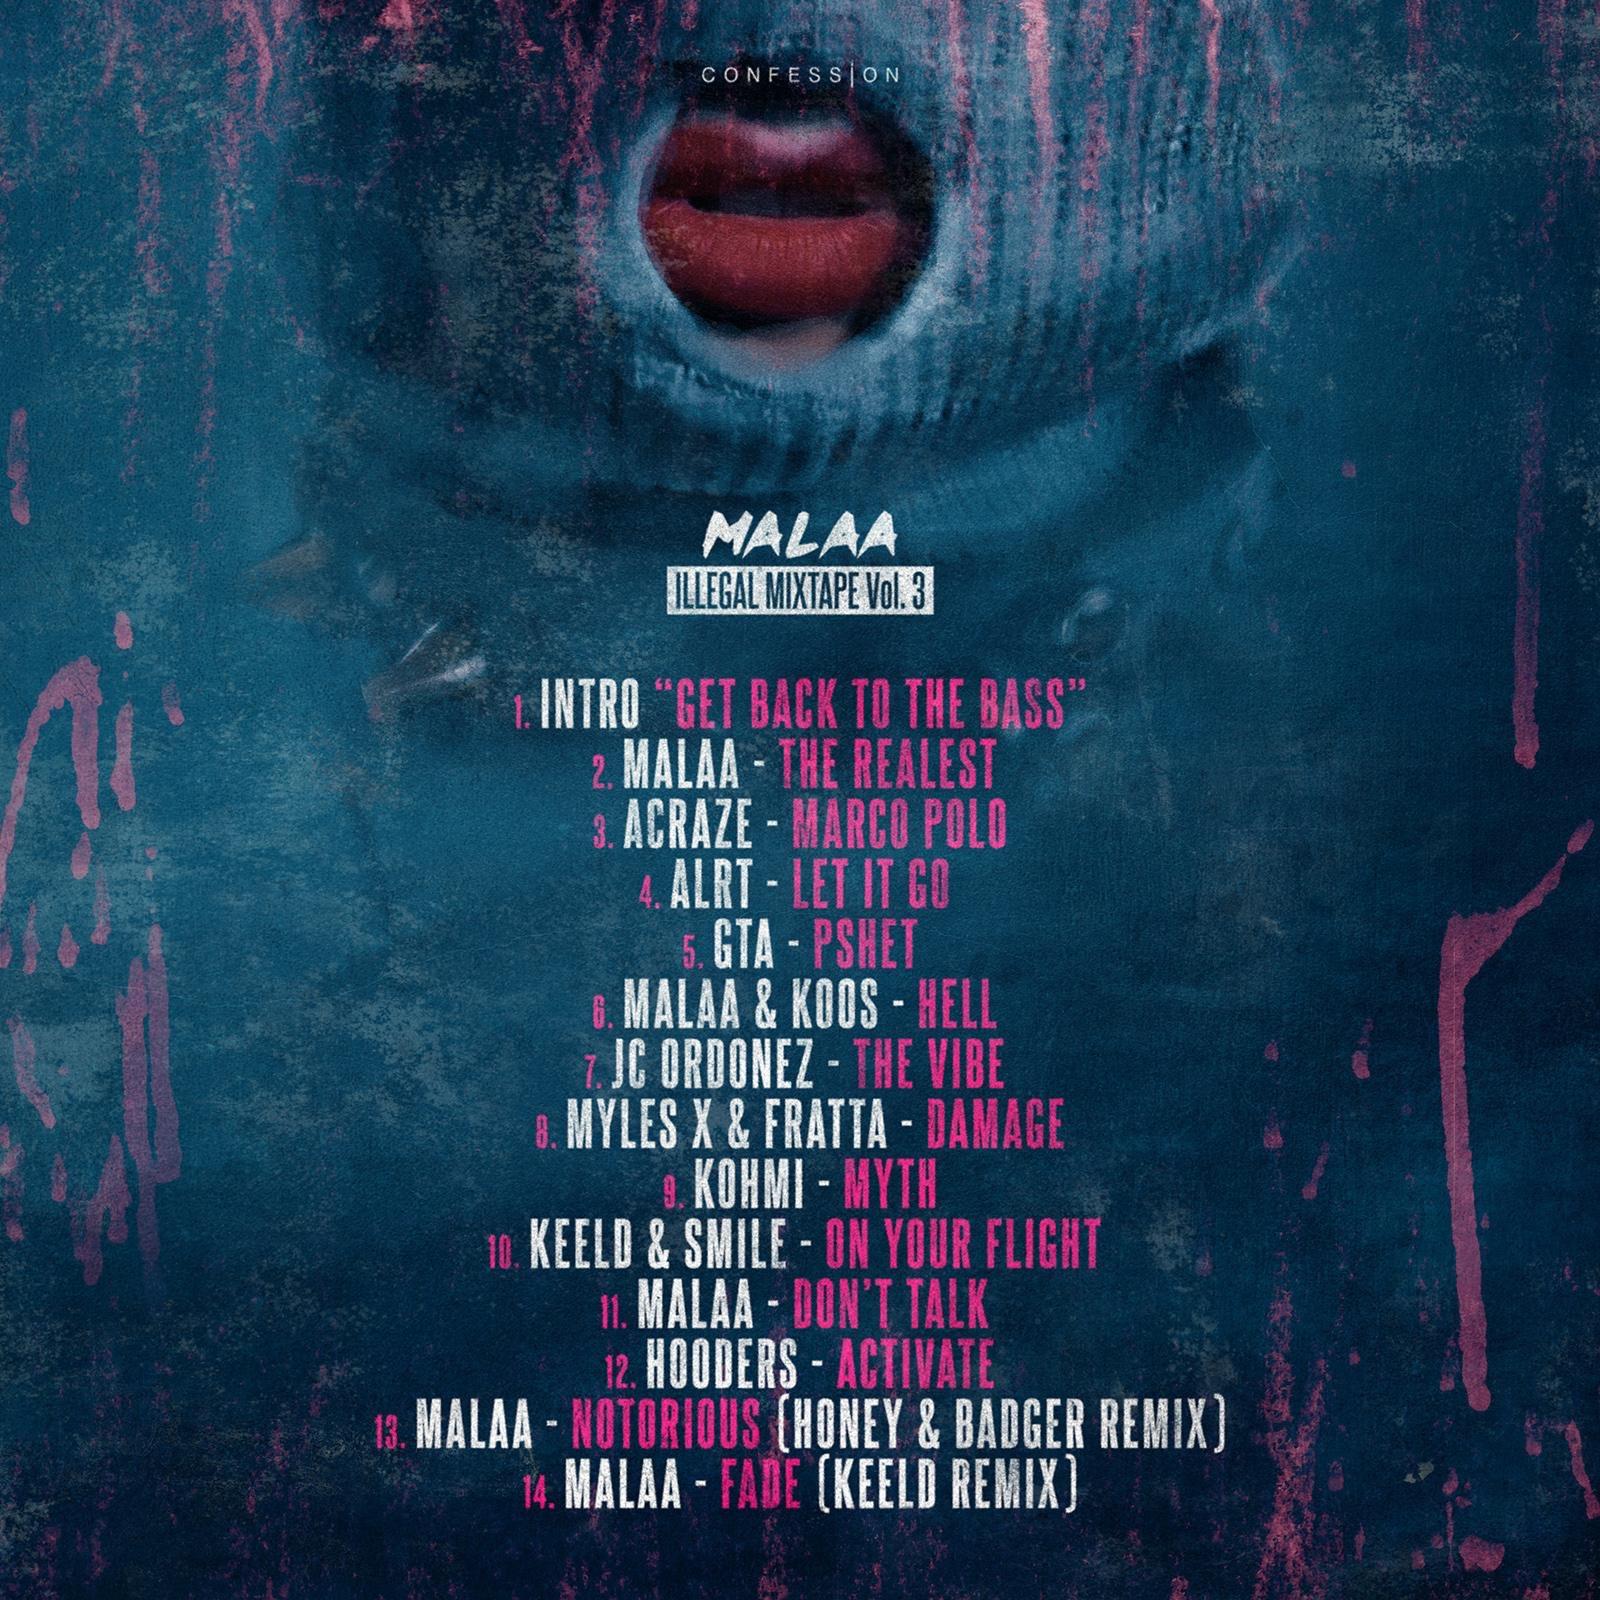 malaa illegal mixtape 3 tracklist